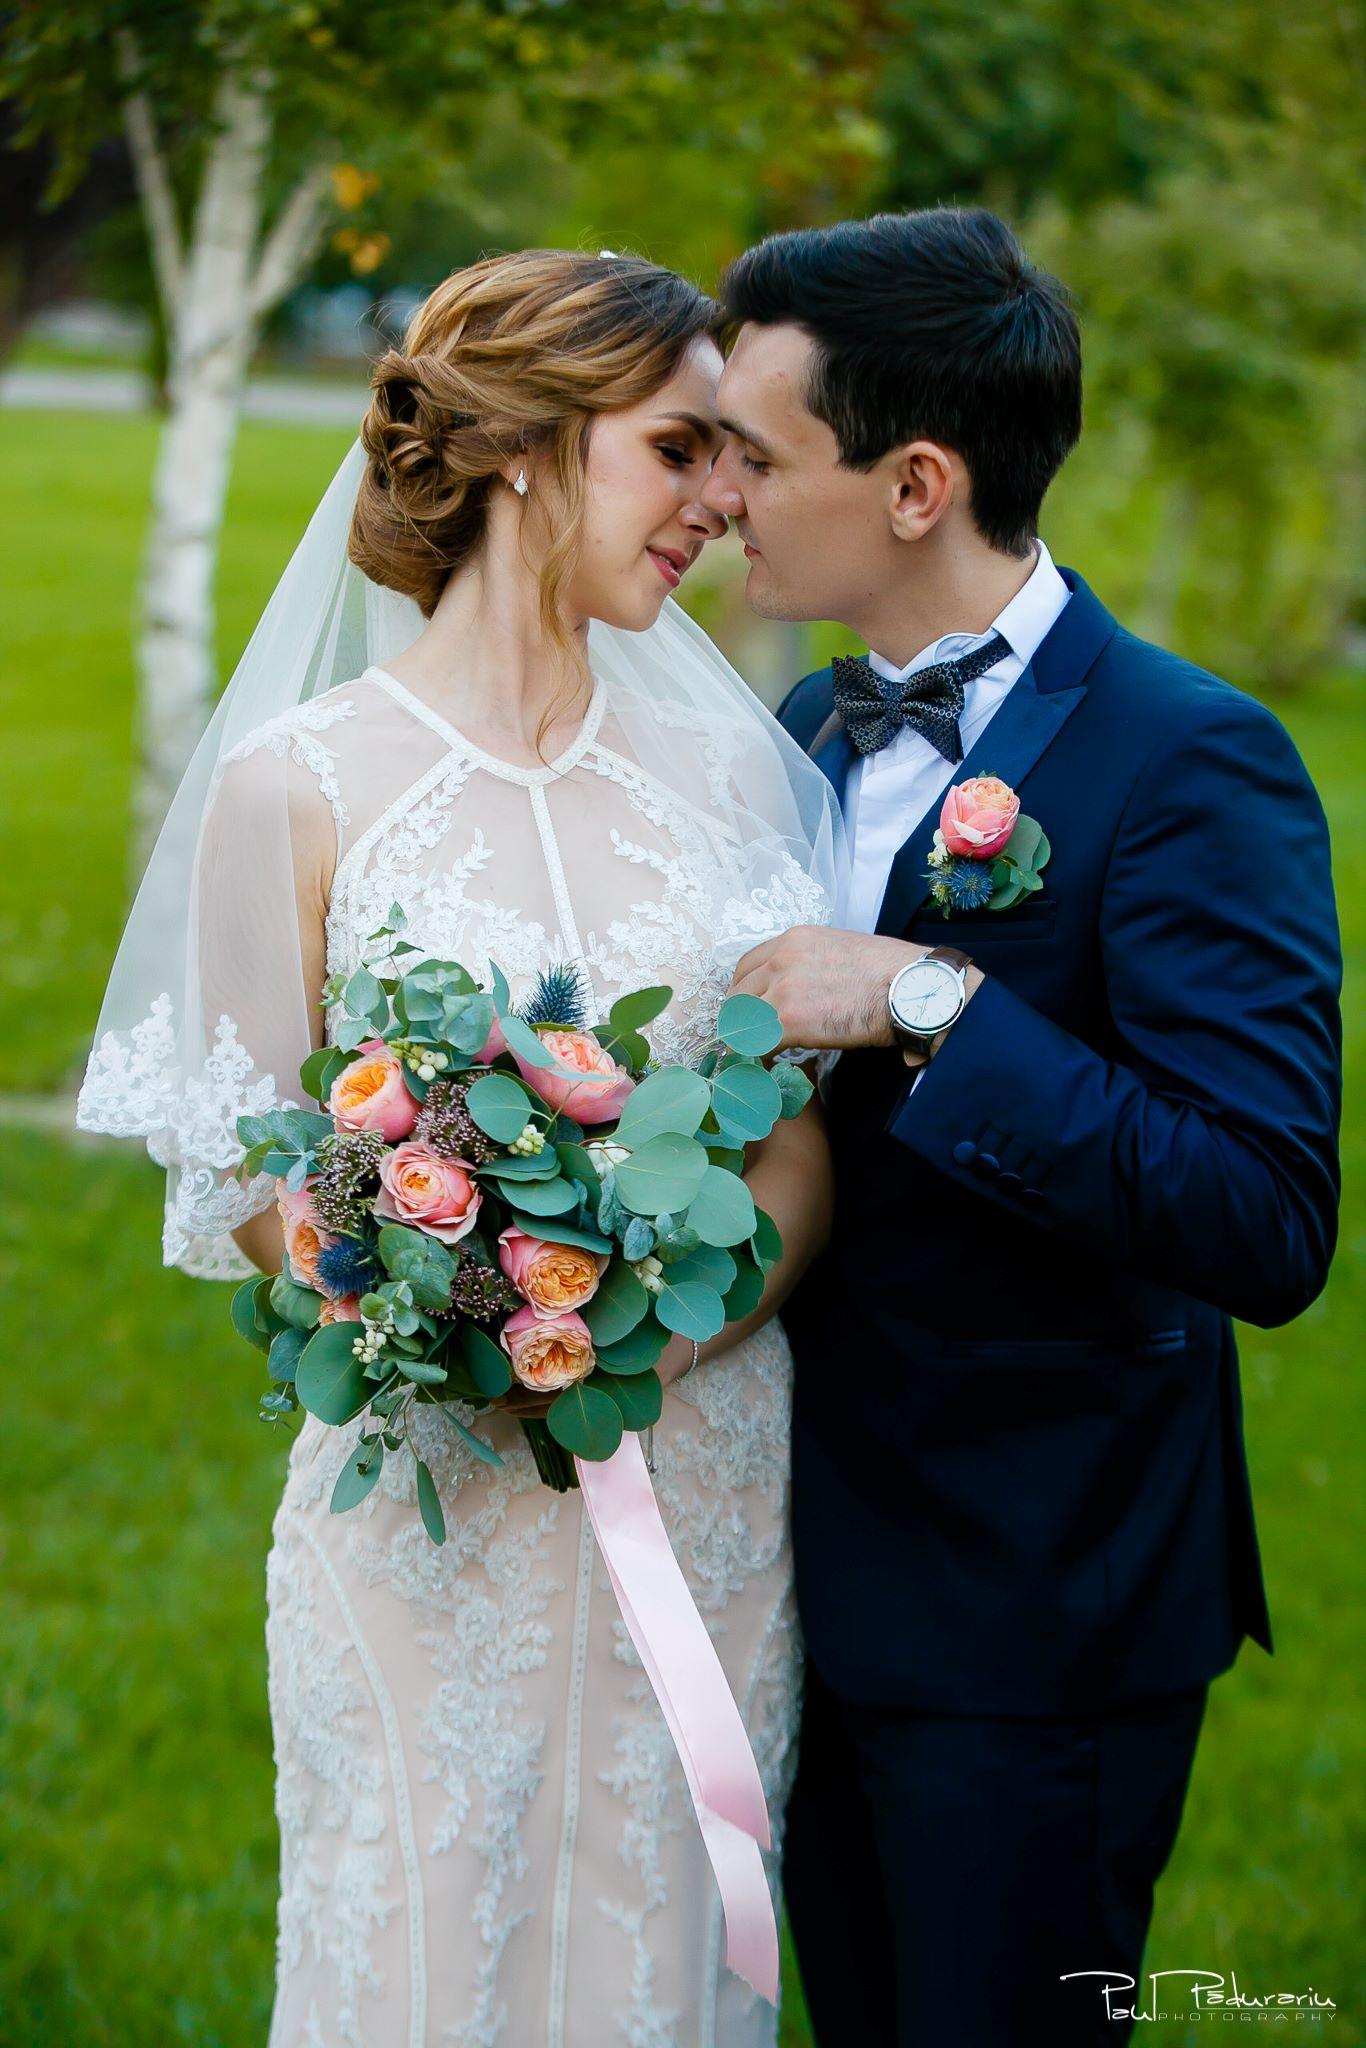 Nicoleta si Catalin fotografie nunta Iasi sedinta foto Restaurant Capitol fotograf paul padurariu 2018 1